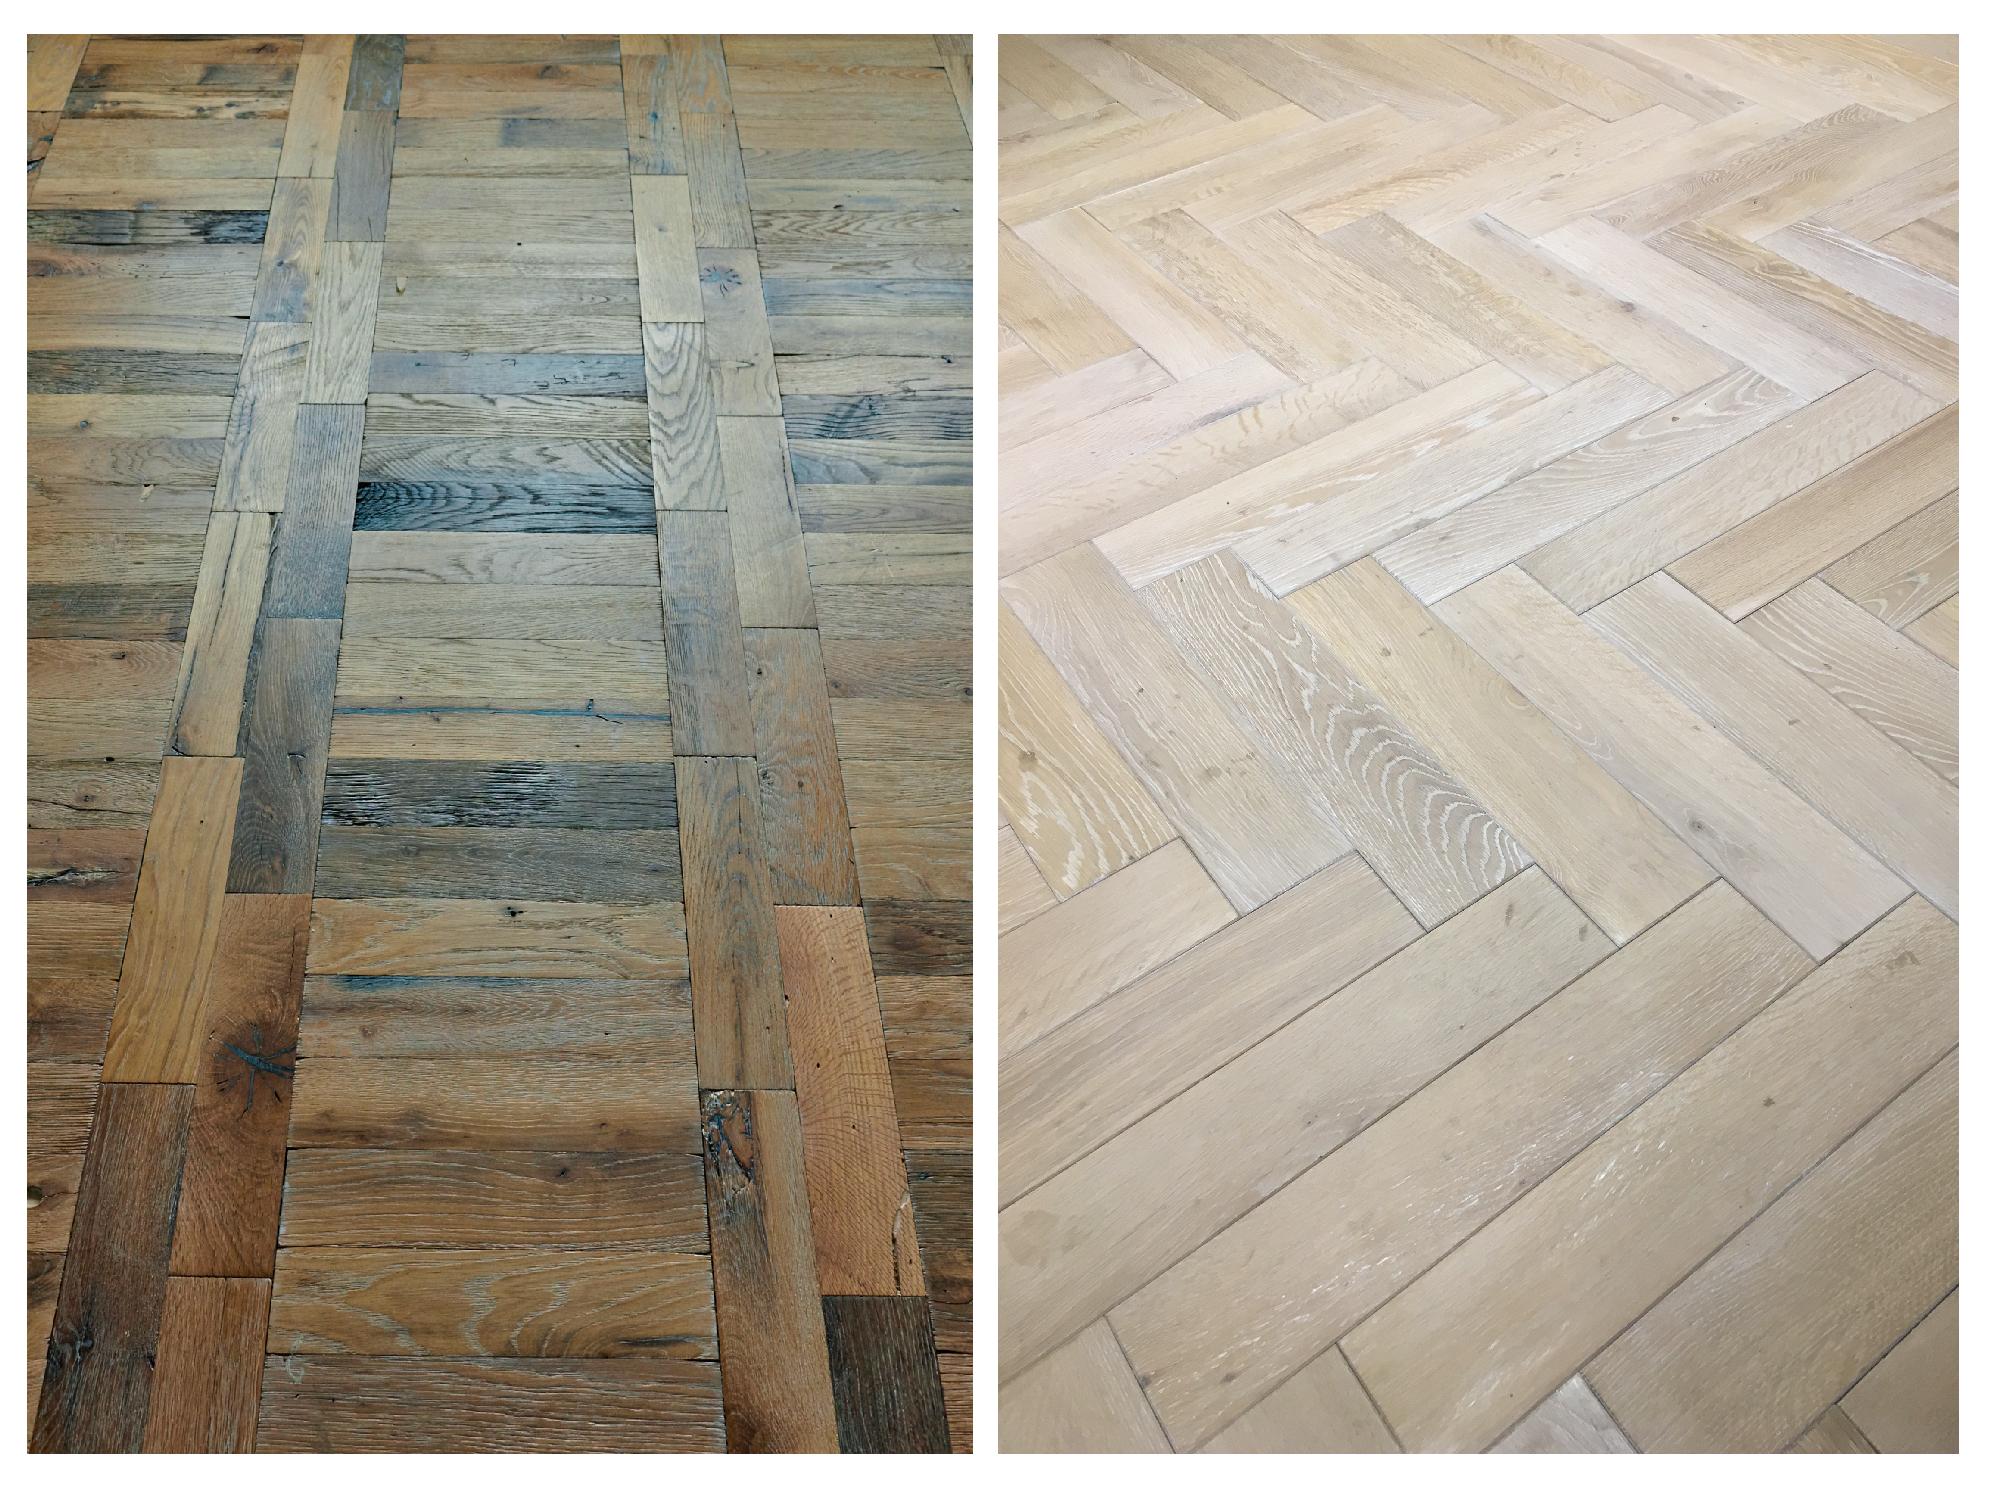 Parquet oak flooring laid in various patterns